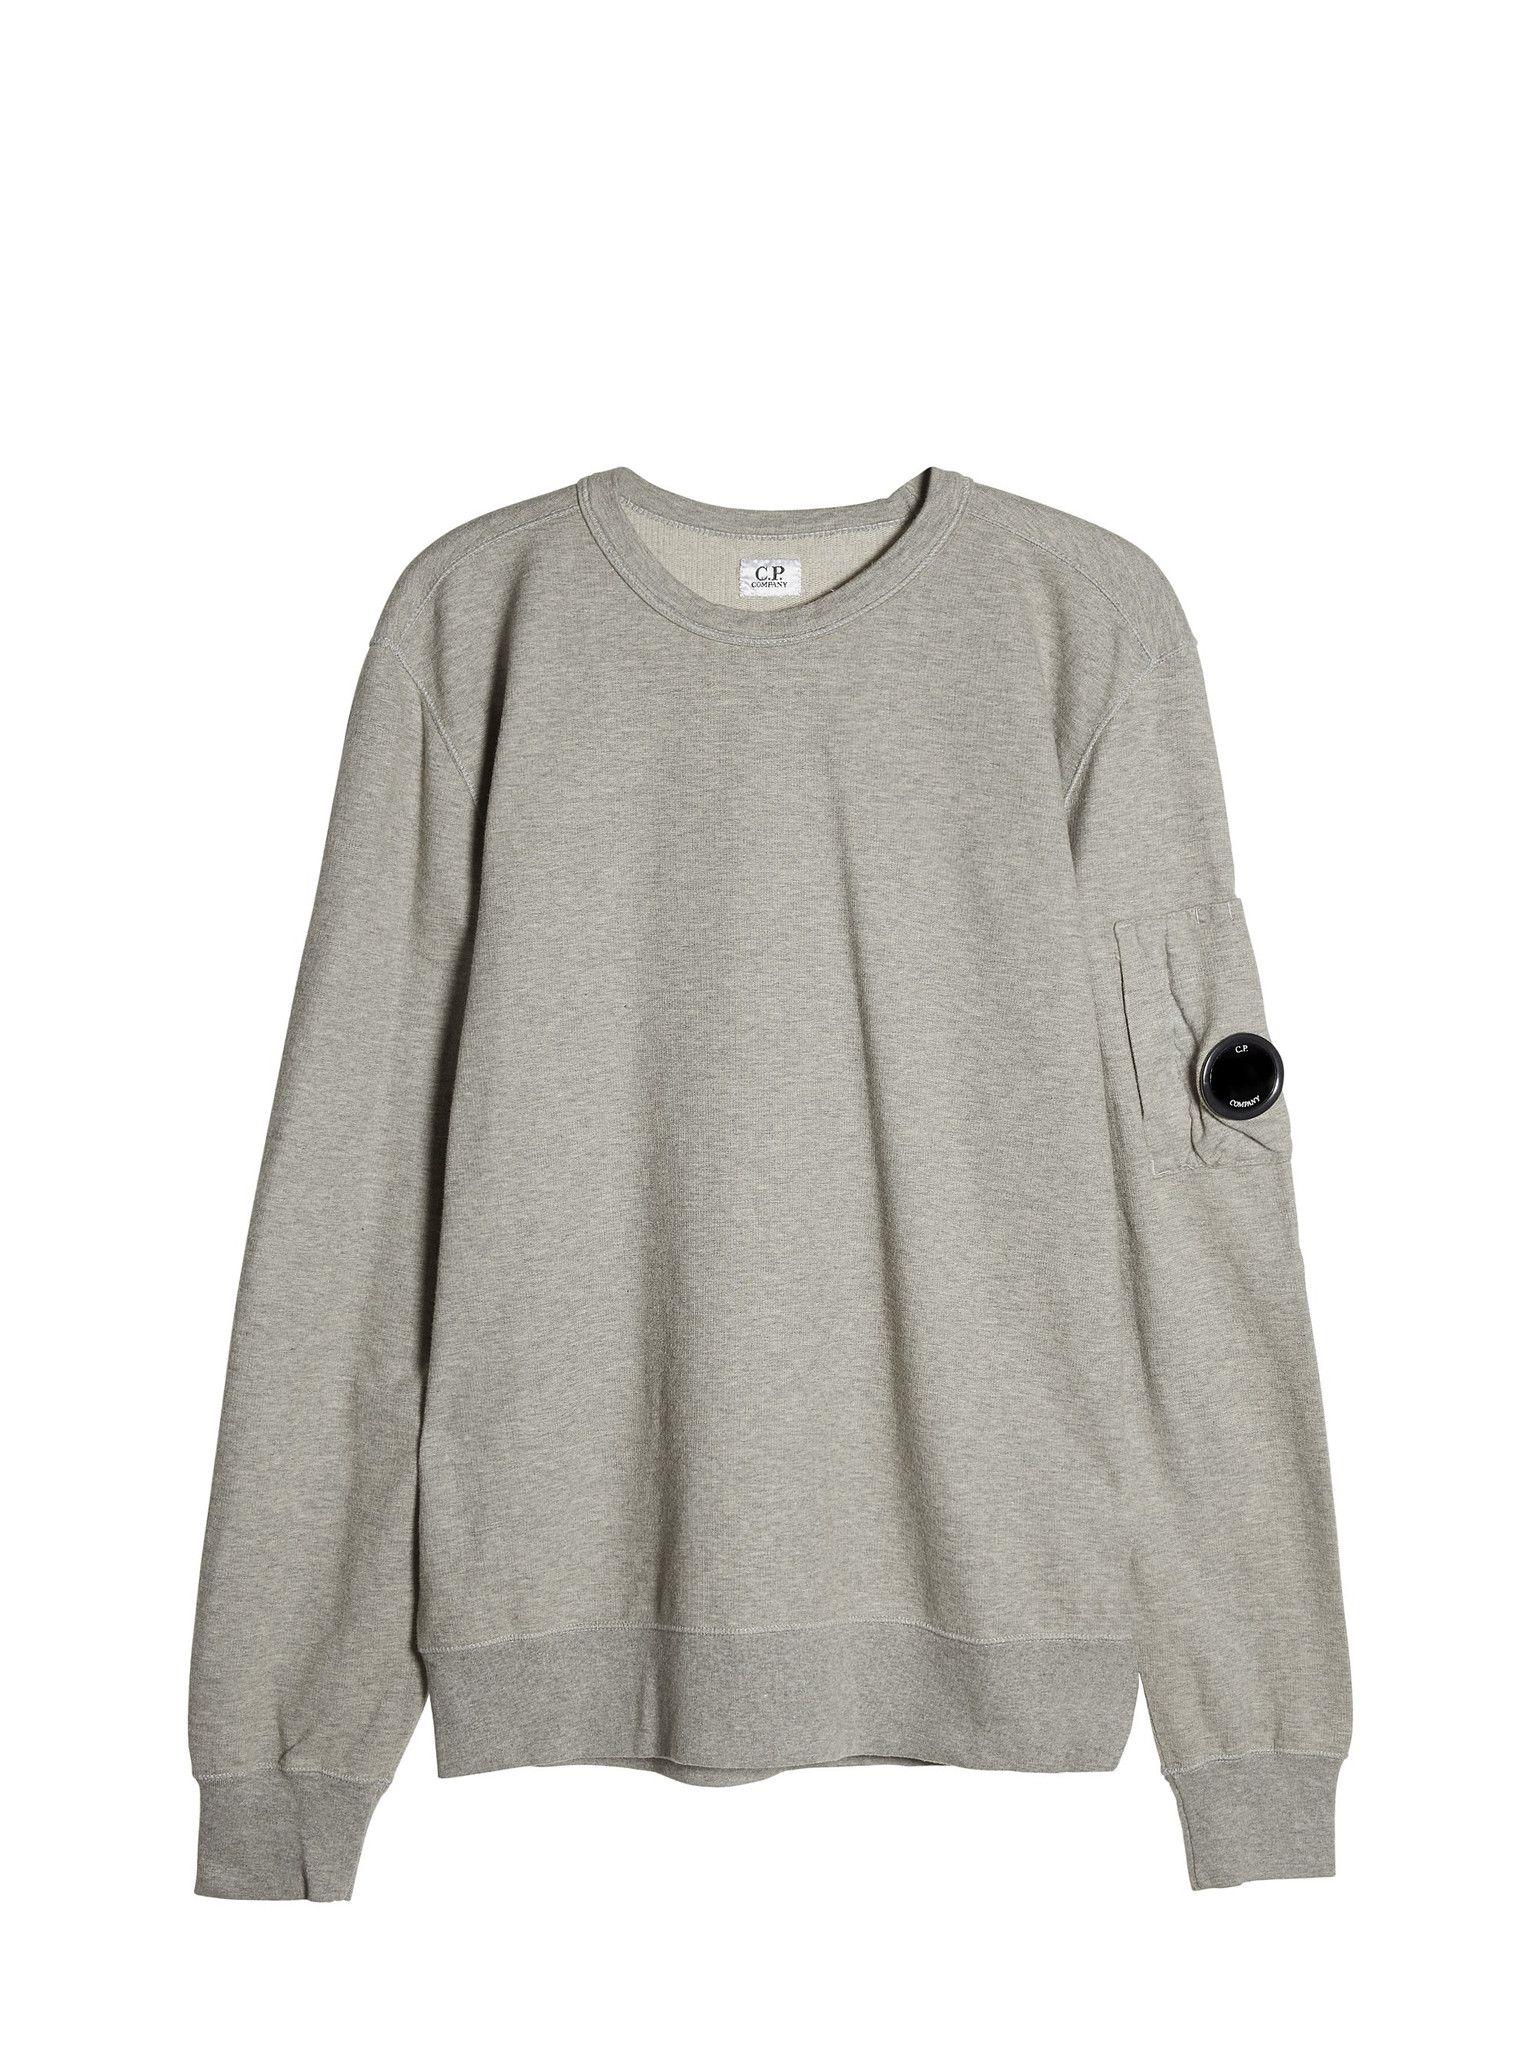 C P Company Garment Dyed Light Fleece Crewneck Sweatshirt In Grey Light Fleece Sweatshirts Garment Dye [ 2048 x 1538 Pixel ]